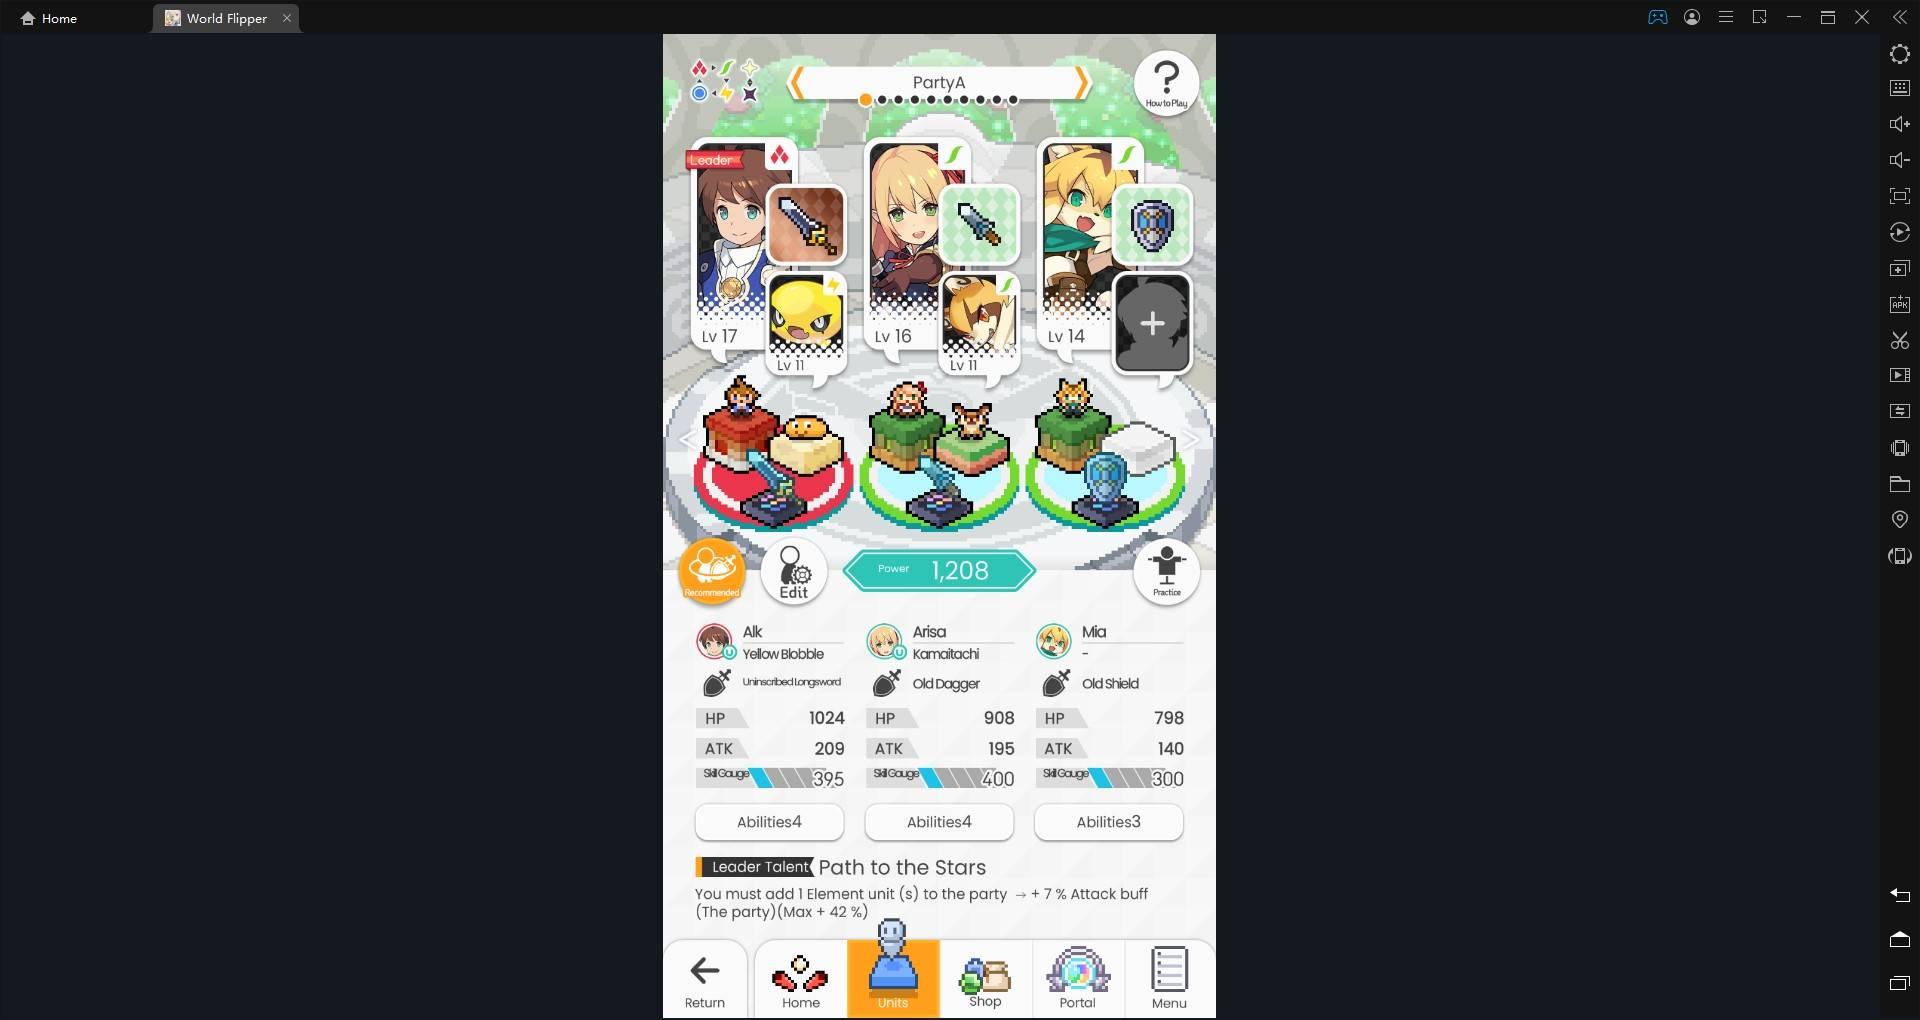 Bermain Game Android World Flipper Menggunakan Emulator LDPlayer di PC: Kumpulan Panduan Dasar dan Tips untuk Pemula